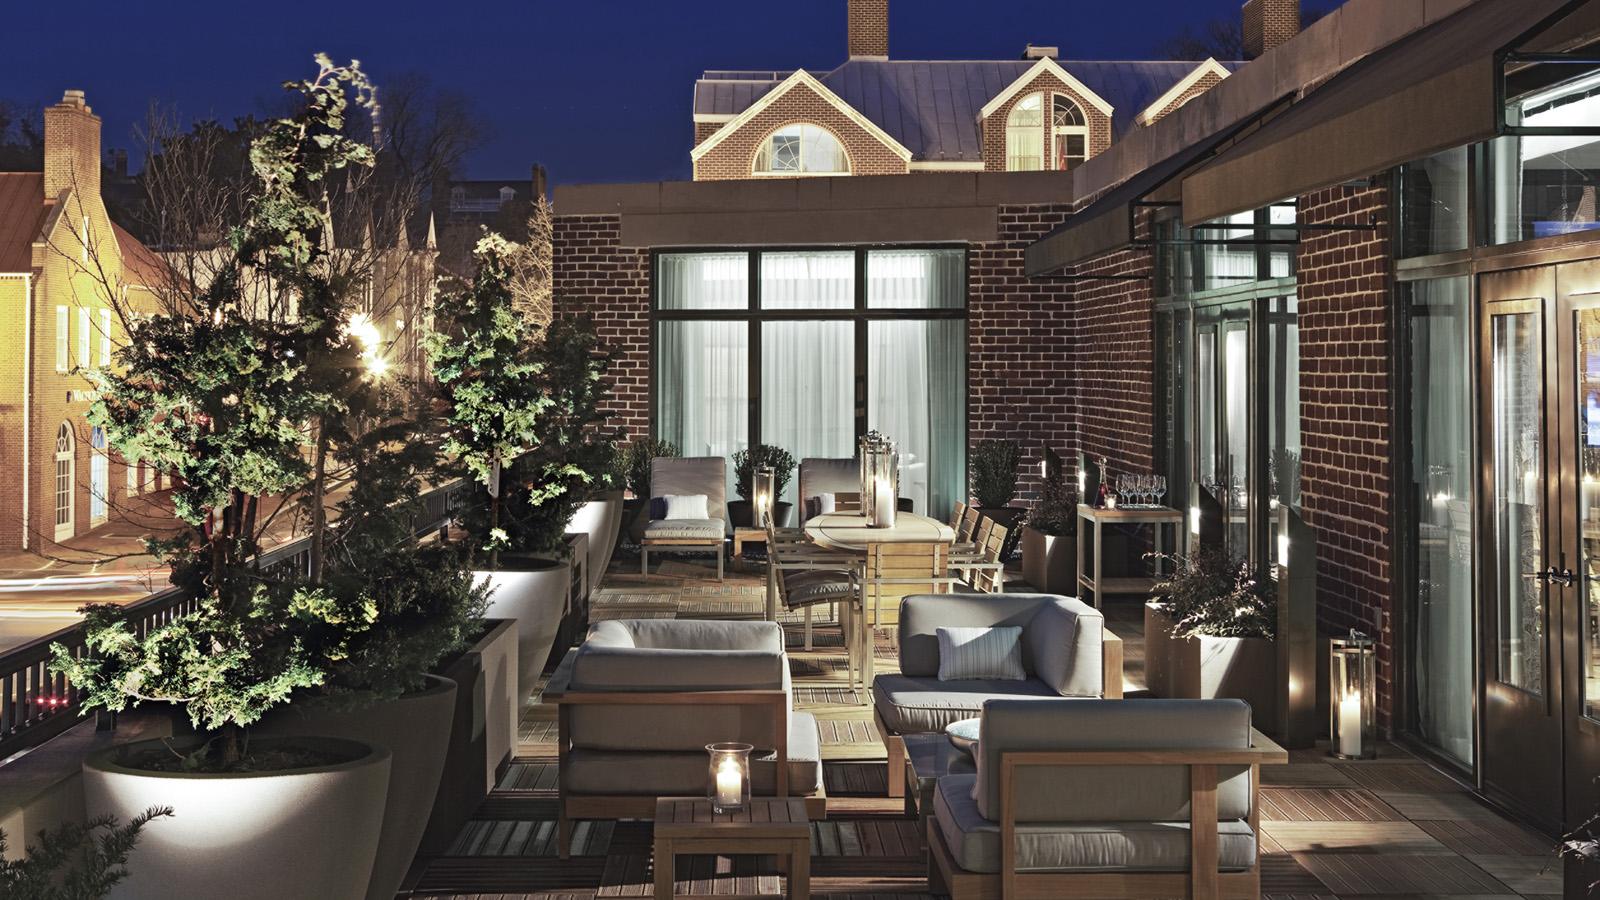 Royal suite at four seasons hotel washington dc redefines luxury